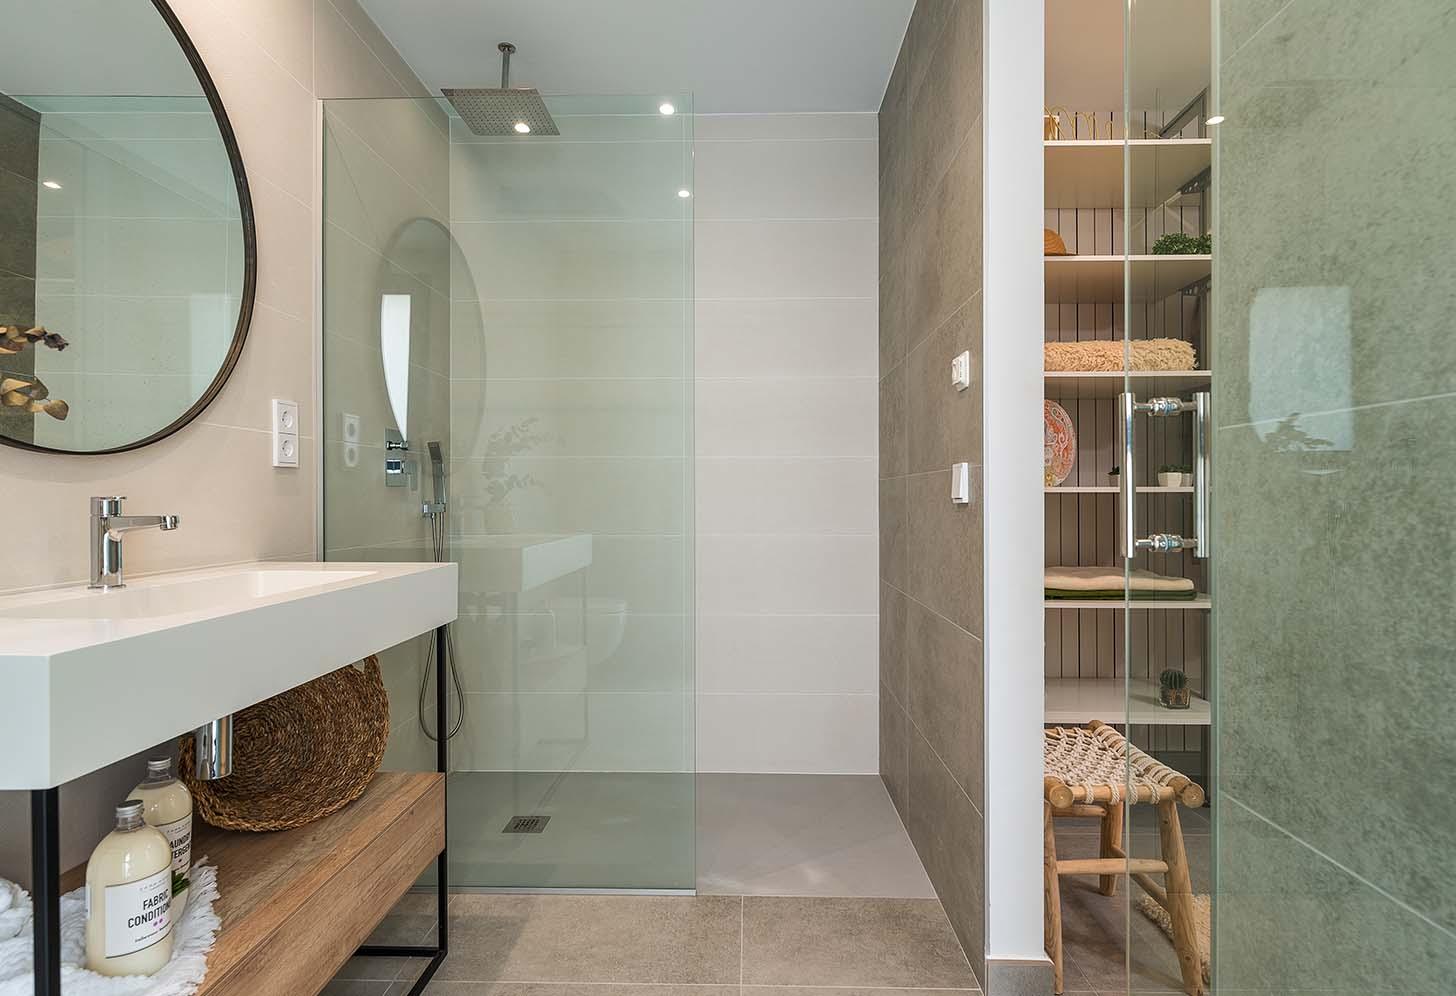 immobilier neuf espagne costa blanca sud alicante rojales salle de bain